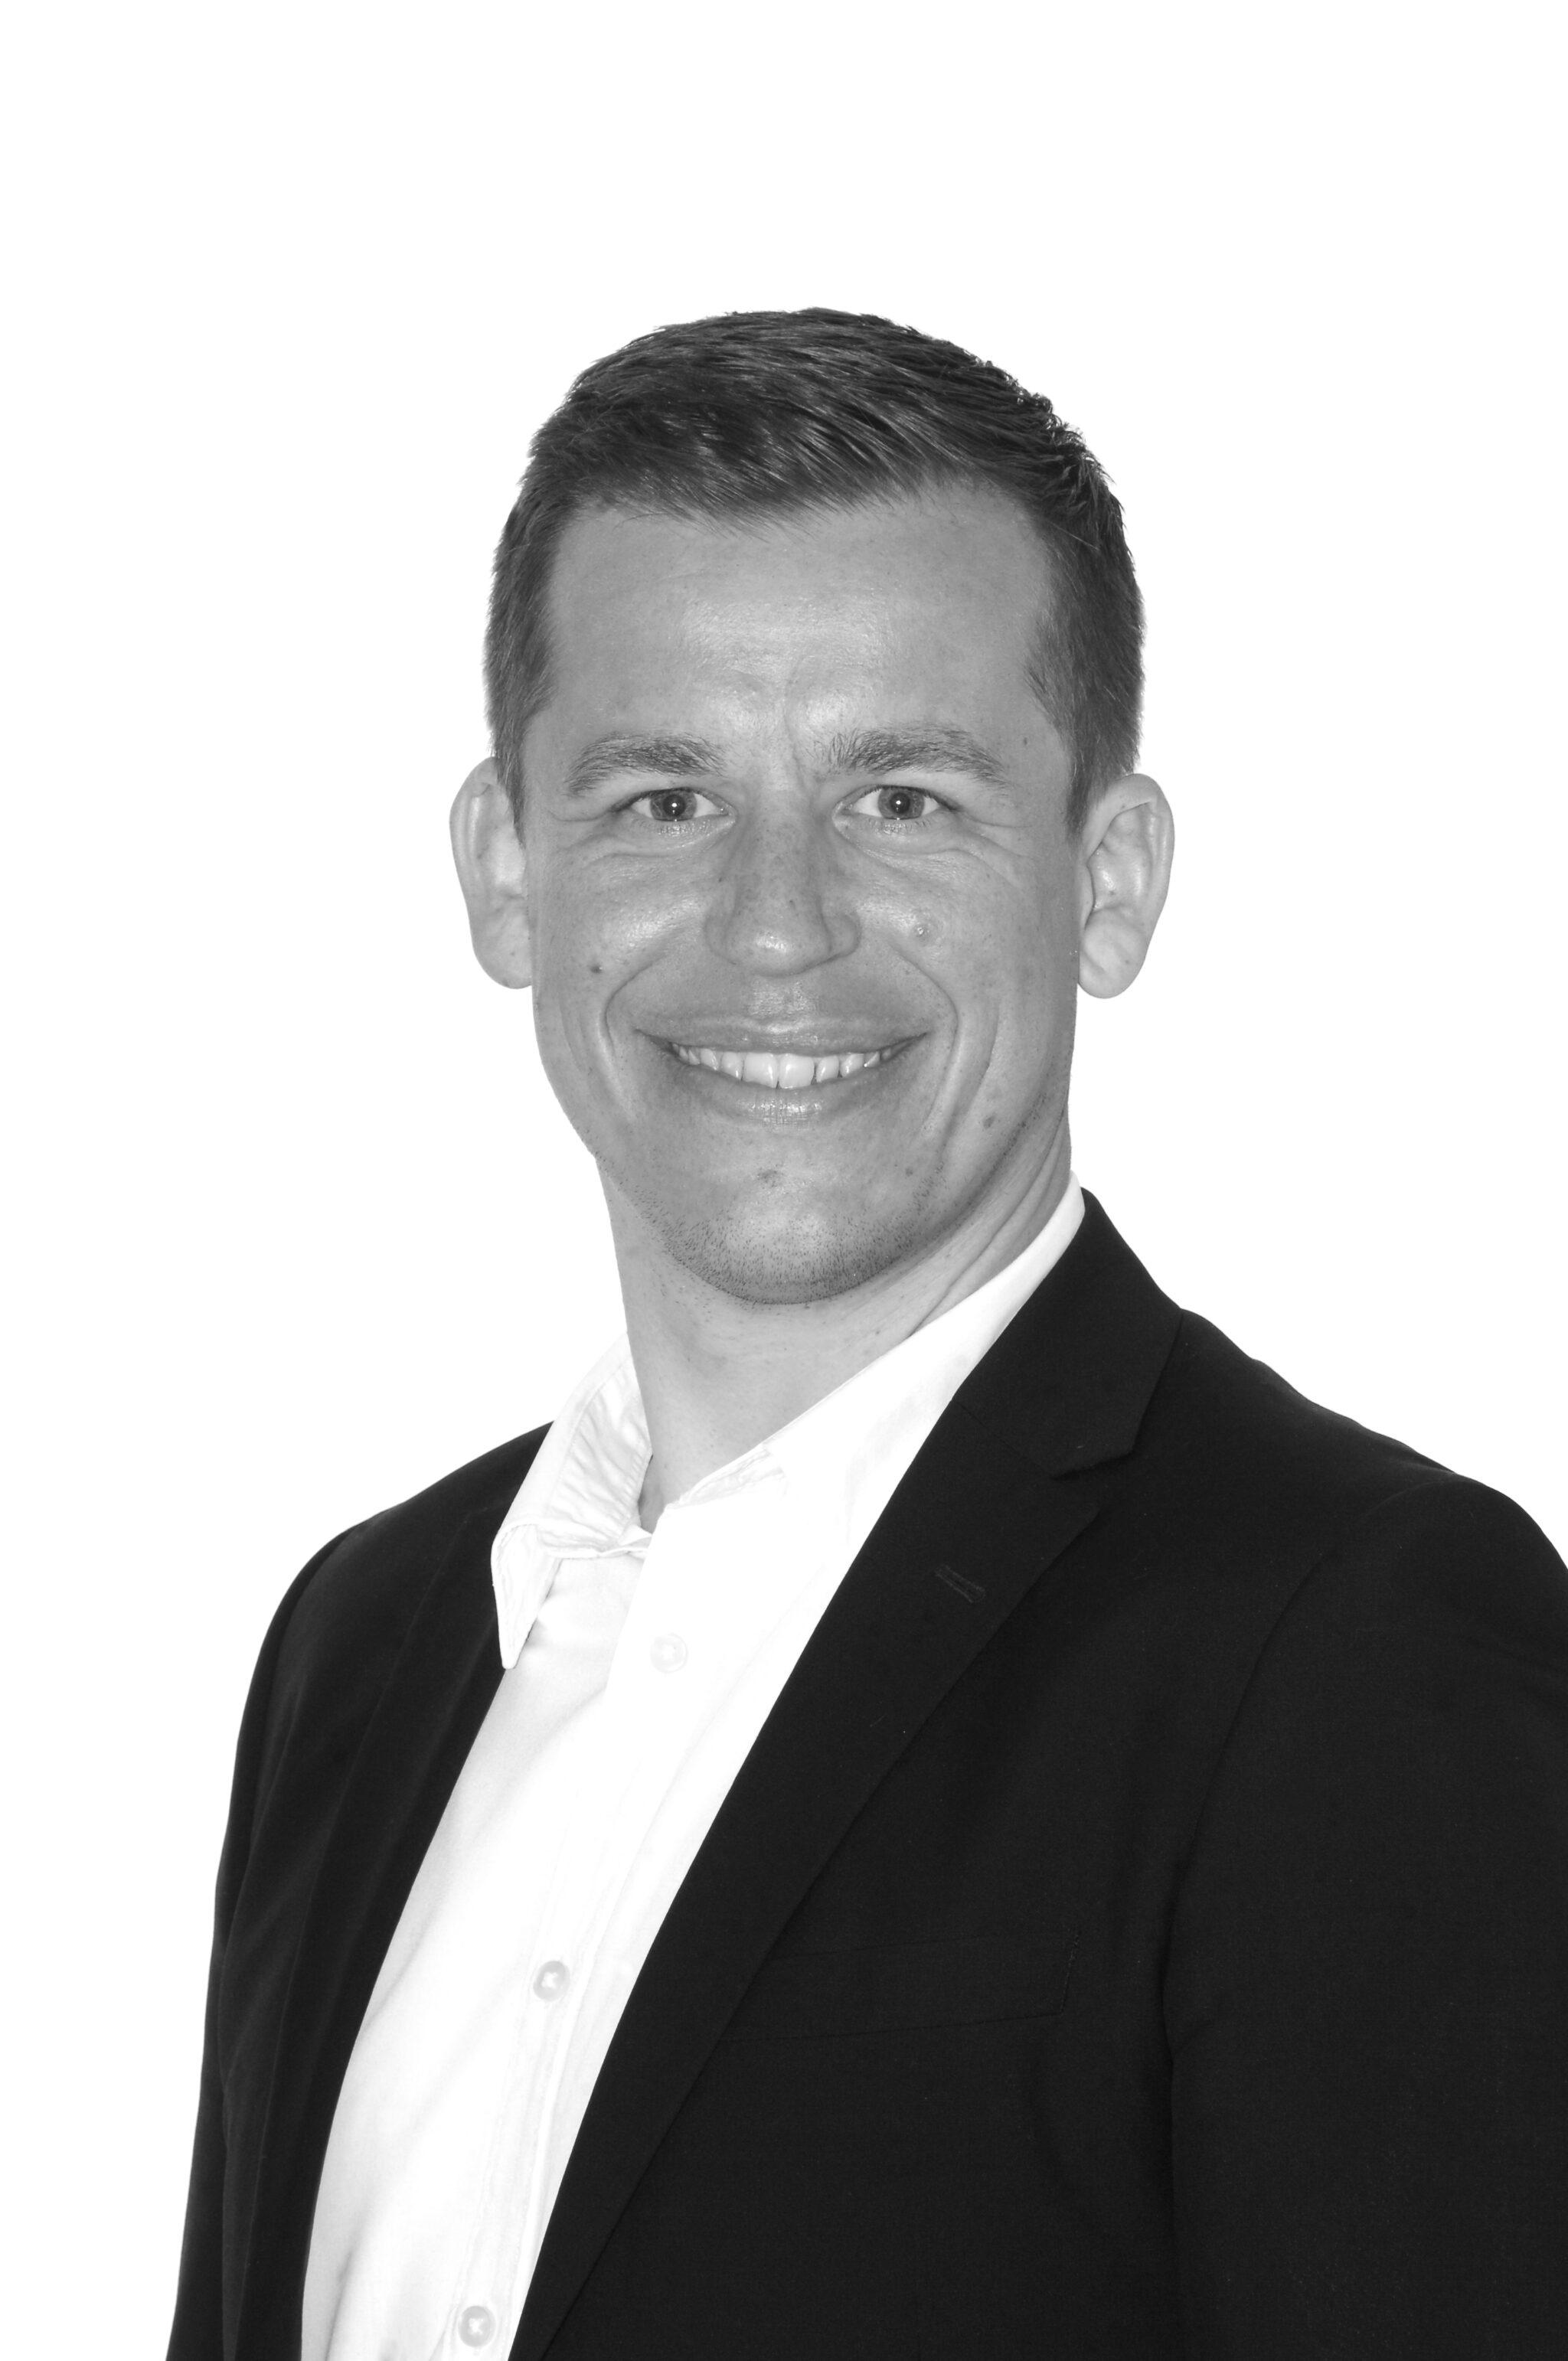 Lars Rothschild Henriksen